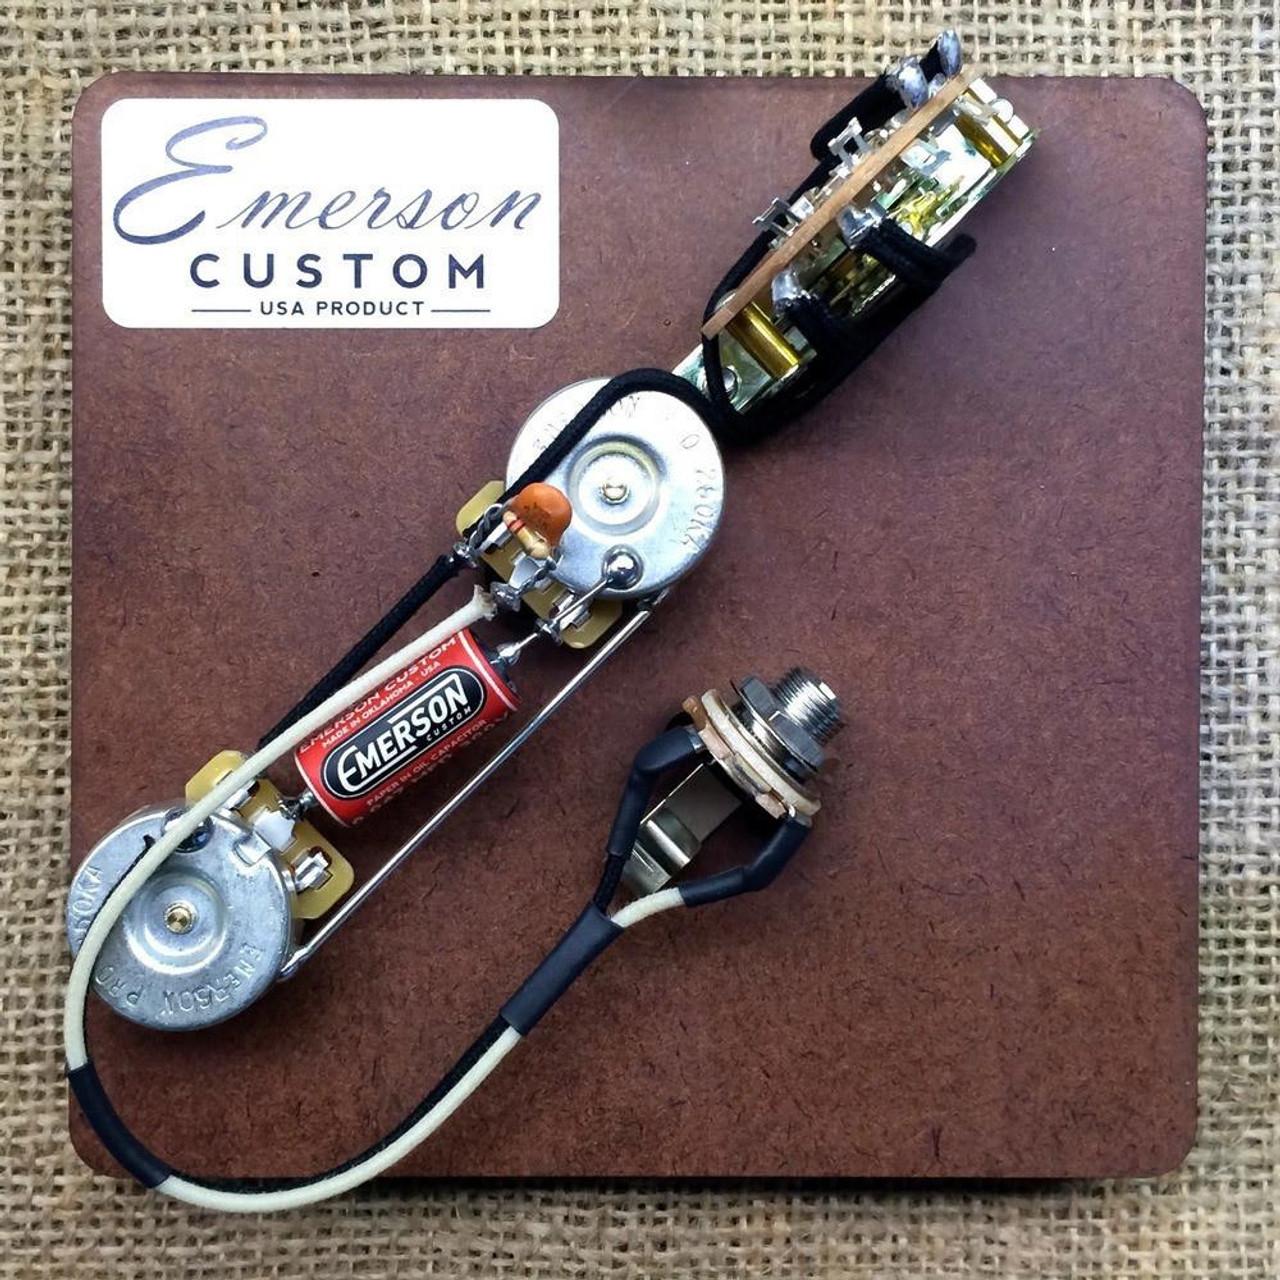 emerson t3 3 way 500k telecaster prewired kit the guitar store rh seattleguitarstore com Fender Telecaster 3-Way Wiring Diagram Squier Telecaster Wiring-Diagram